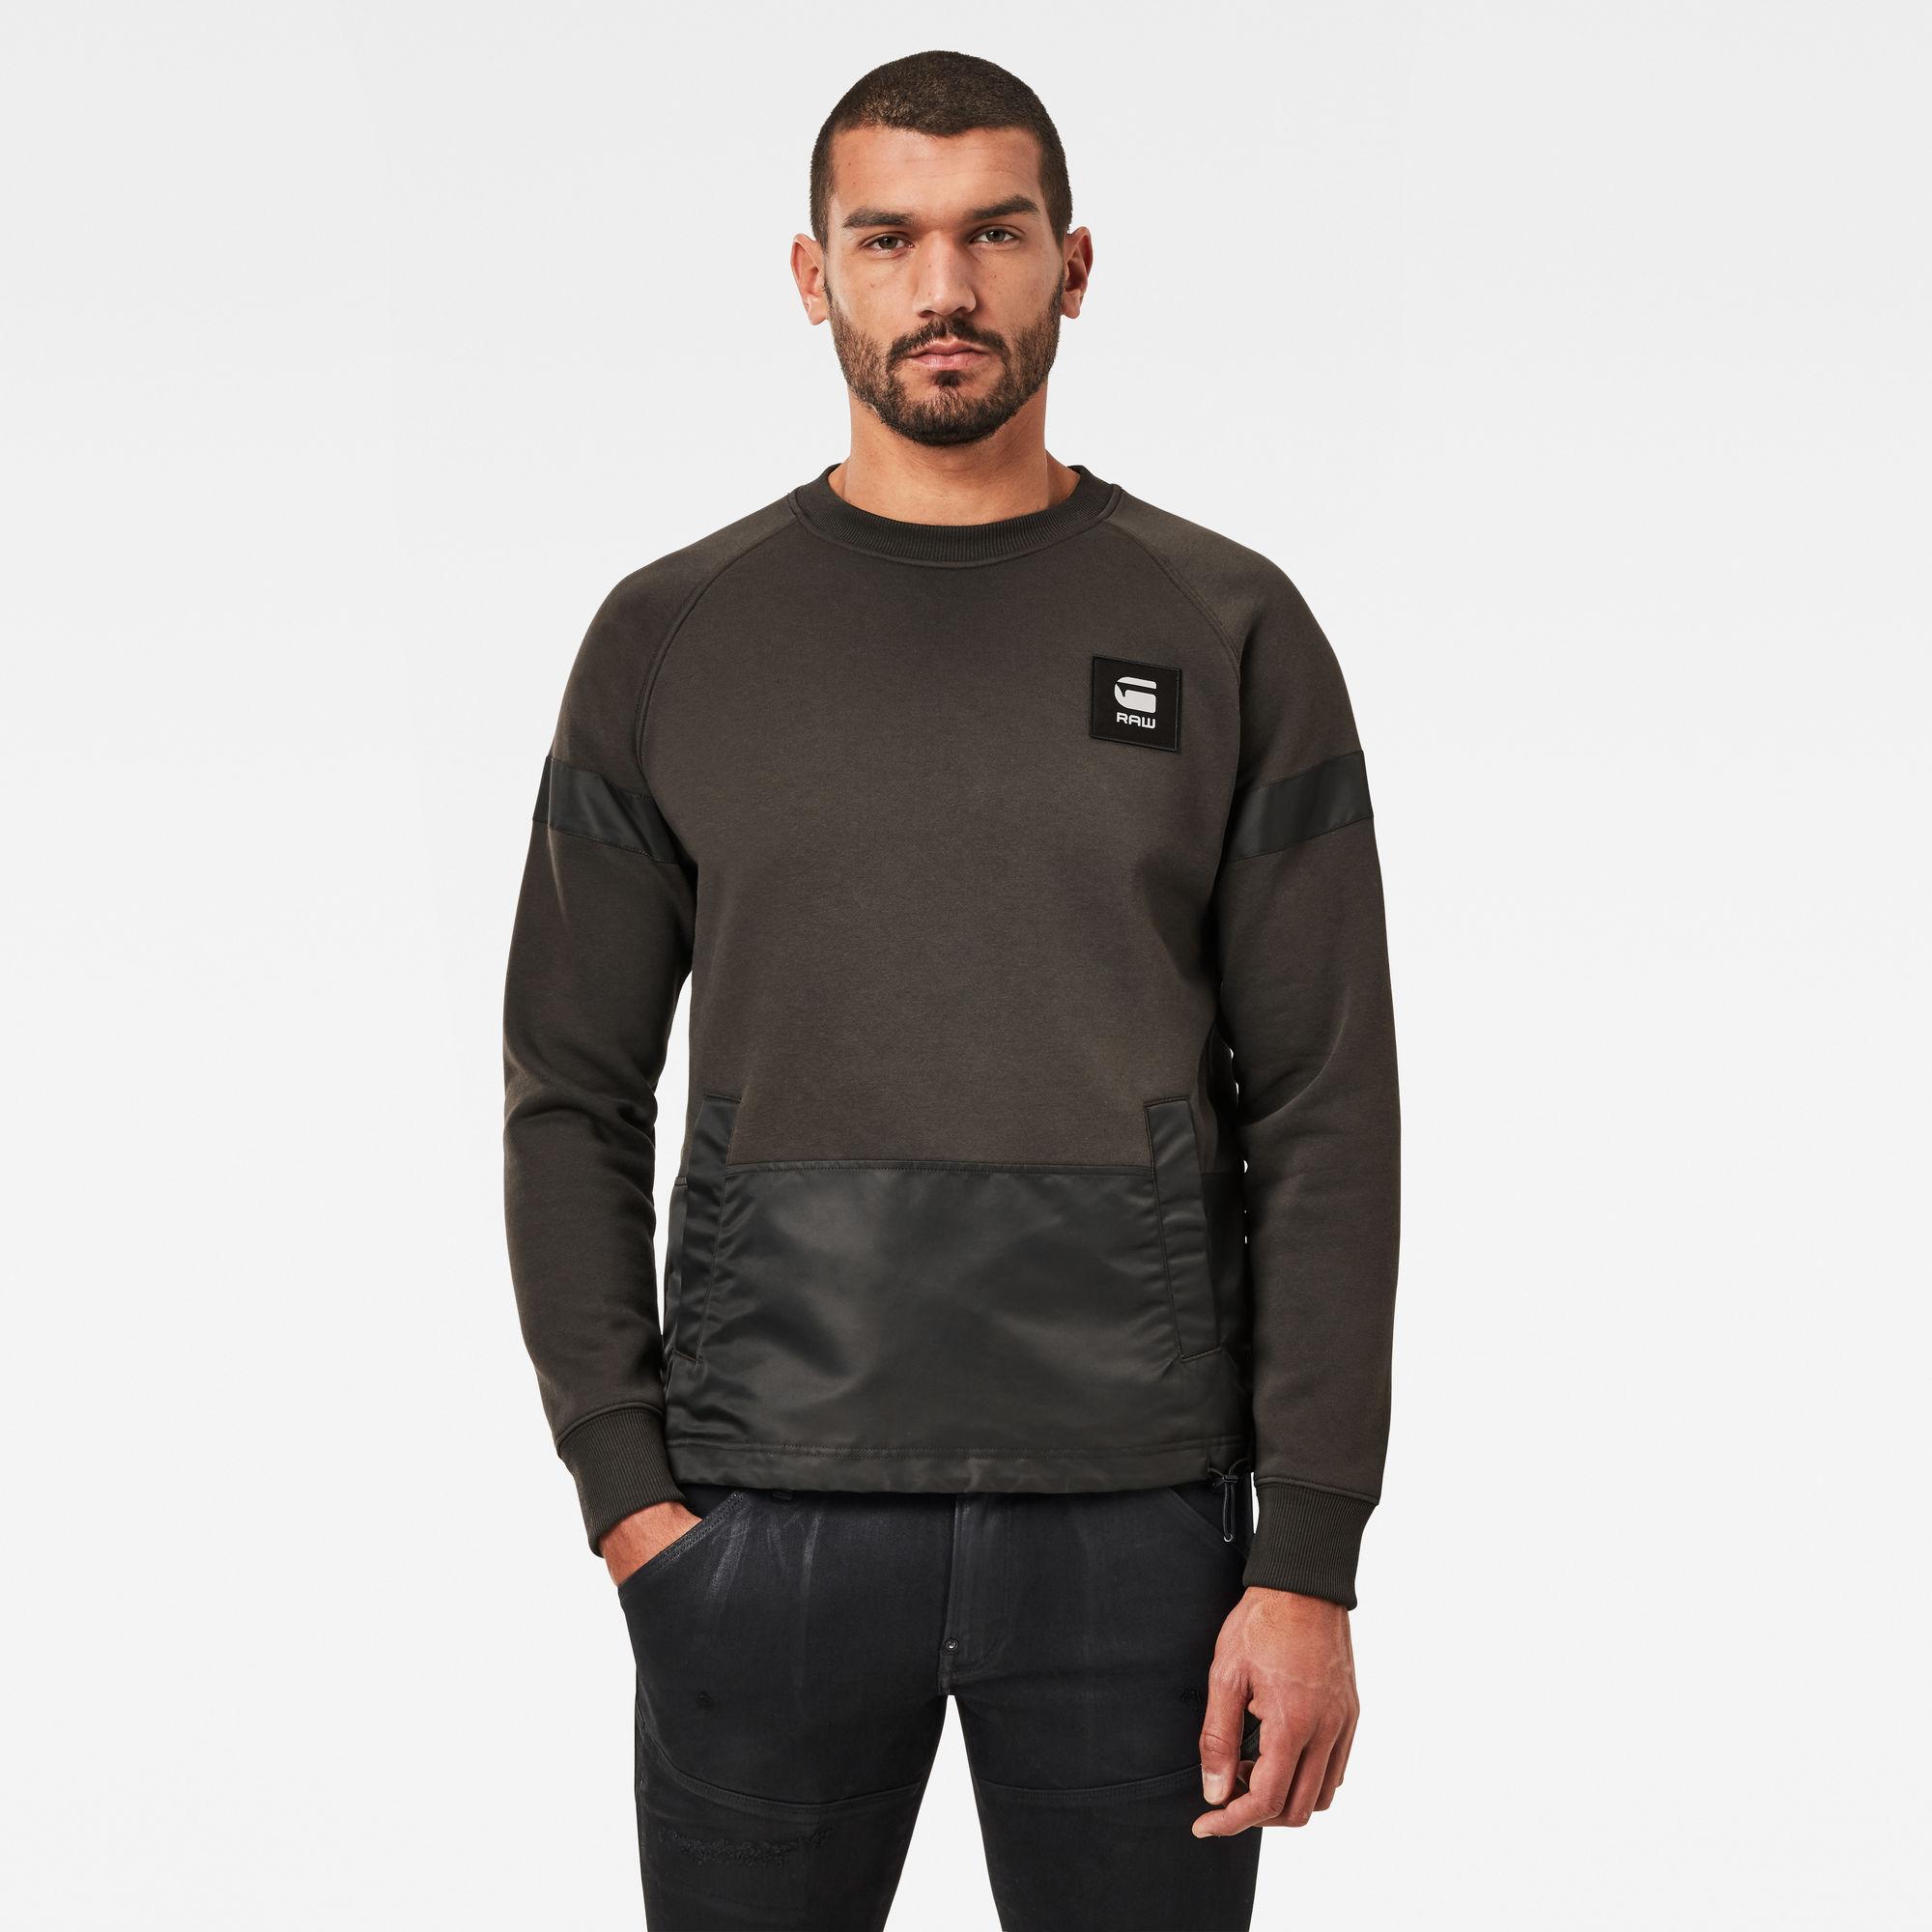 G-Star RAW Heren PM Sweater Grijs